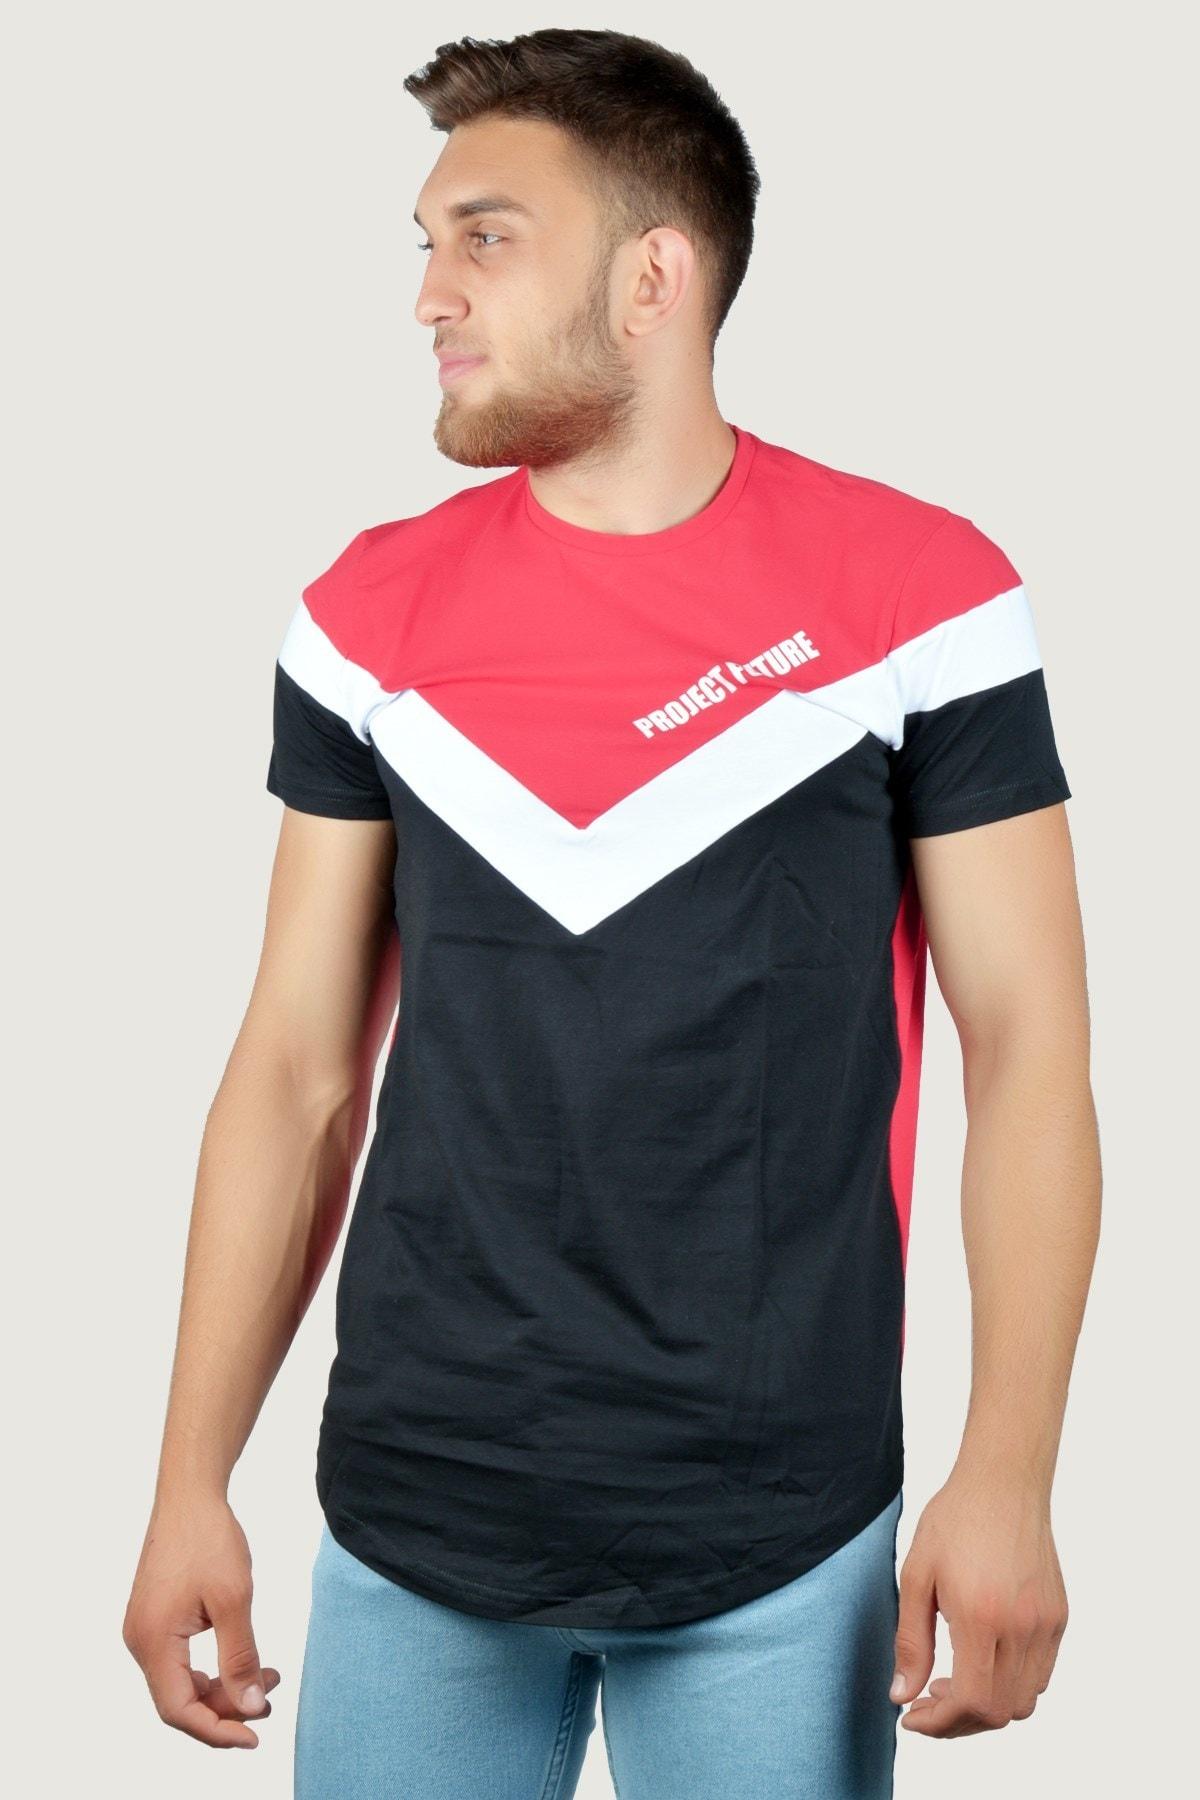 Terapi Men Erkek T-Shirt 9Y-3400533-066 Kırmızı-Siyah